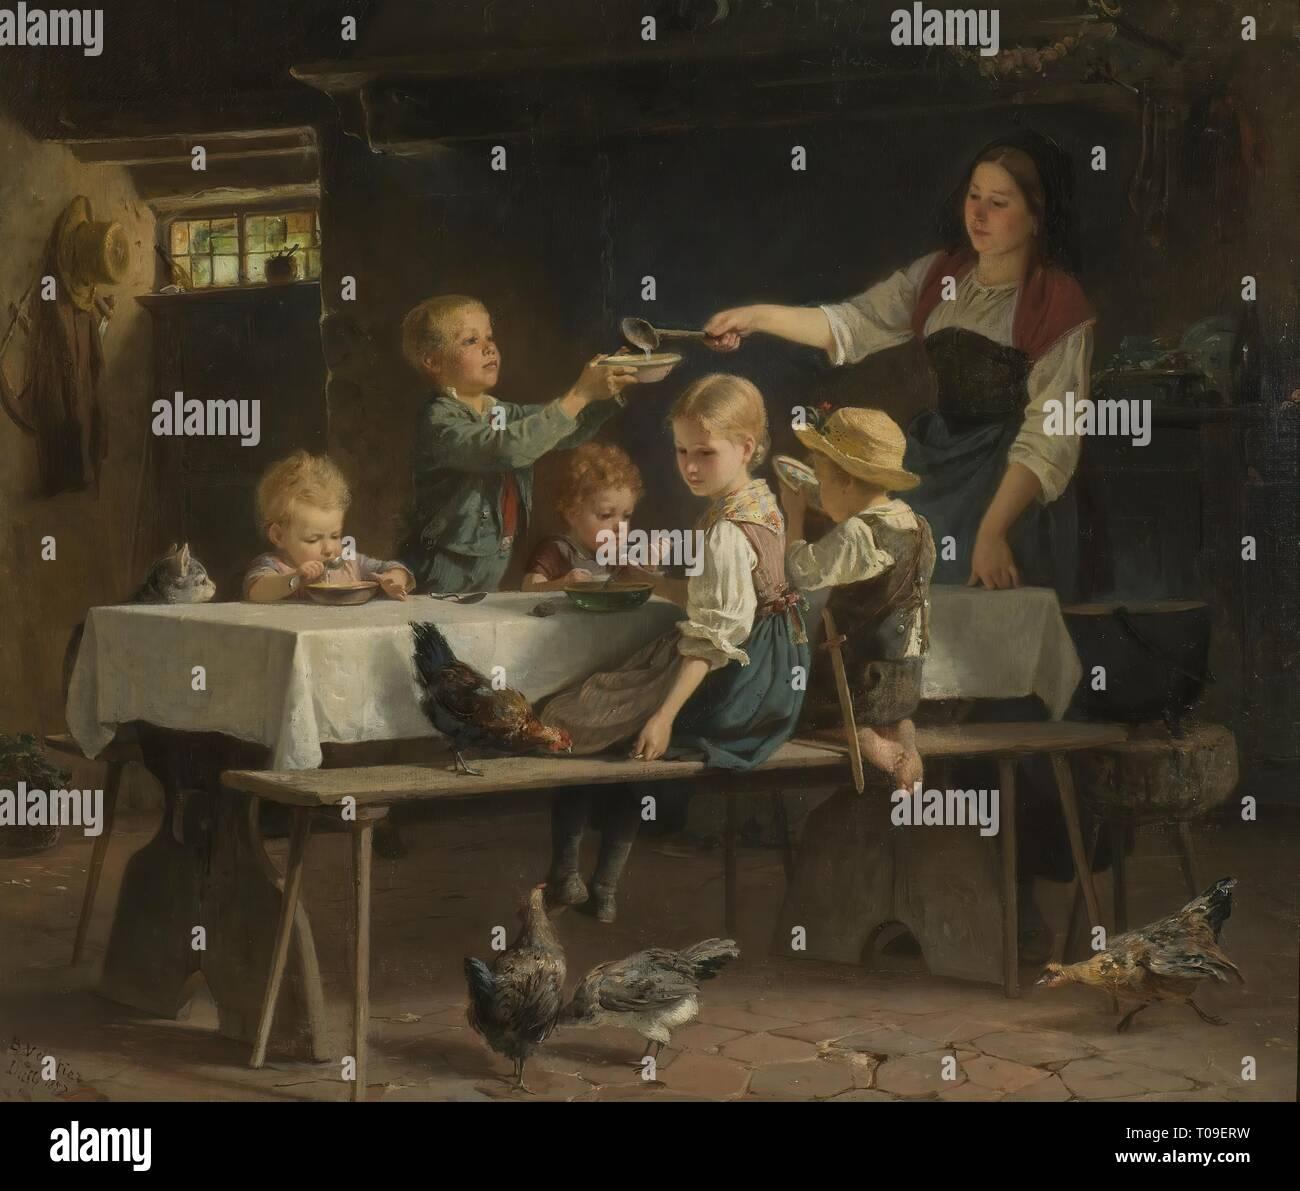 'Eating Children'. Germany, 1857. Dimensions: 54,5x65 cm. Museum: State Hermitage, St. Petersburg. Author: Pierre Vauthier . Vautier, Marc Louis Benjamin, the Elder. - Stock Image